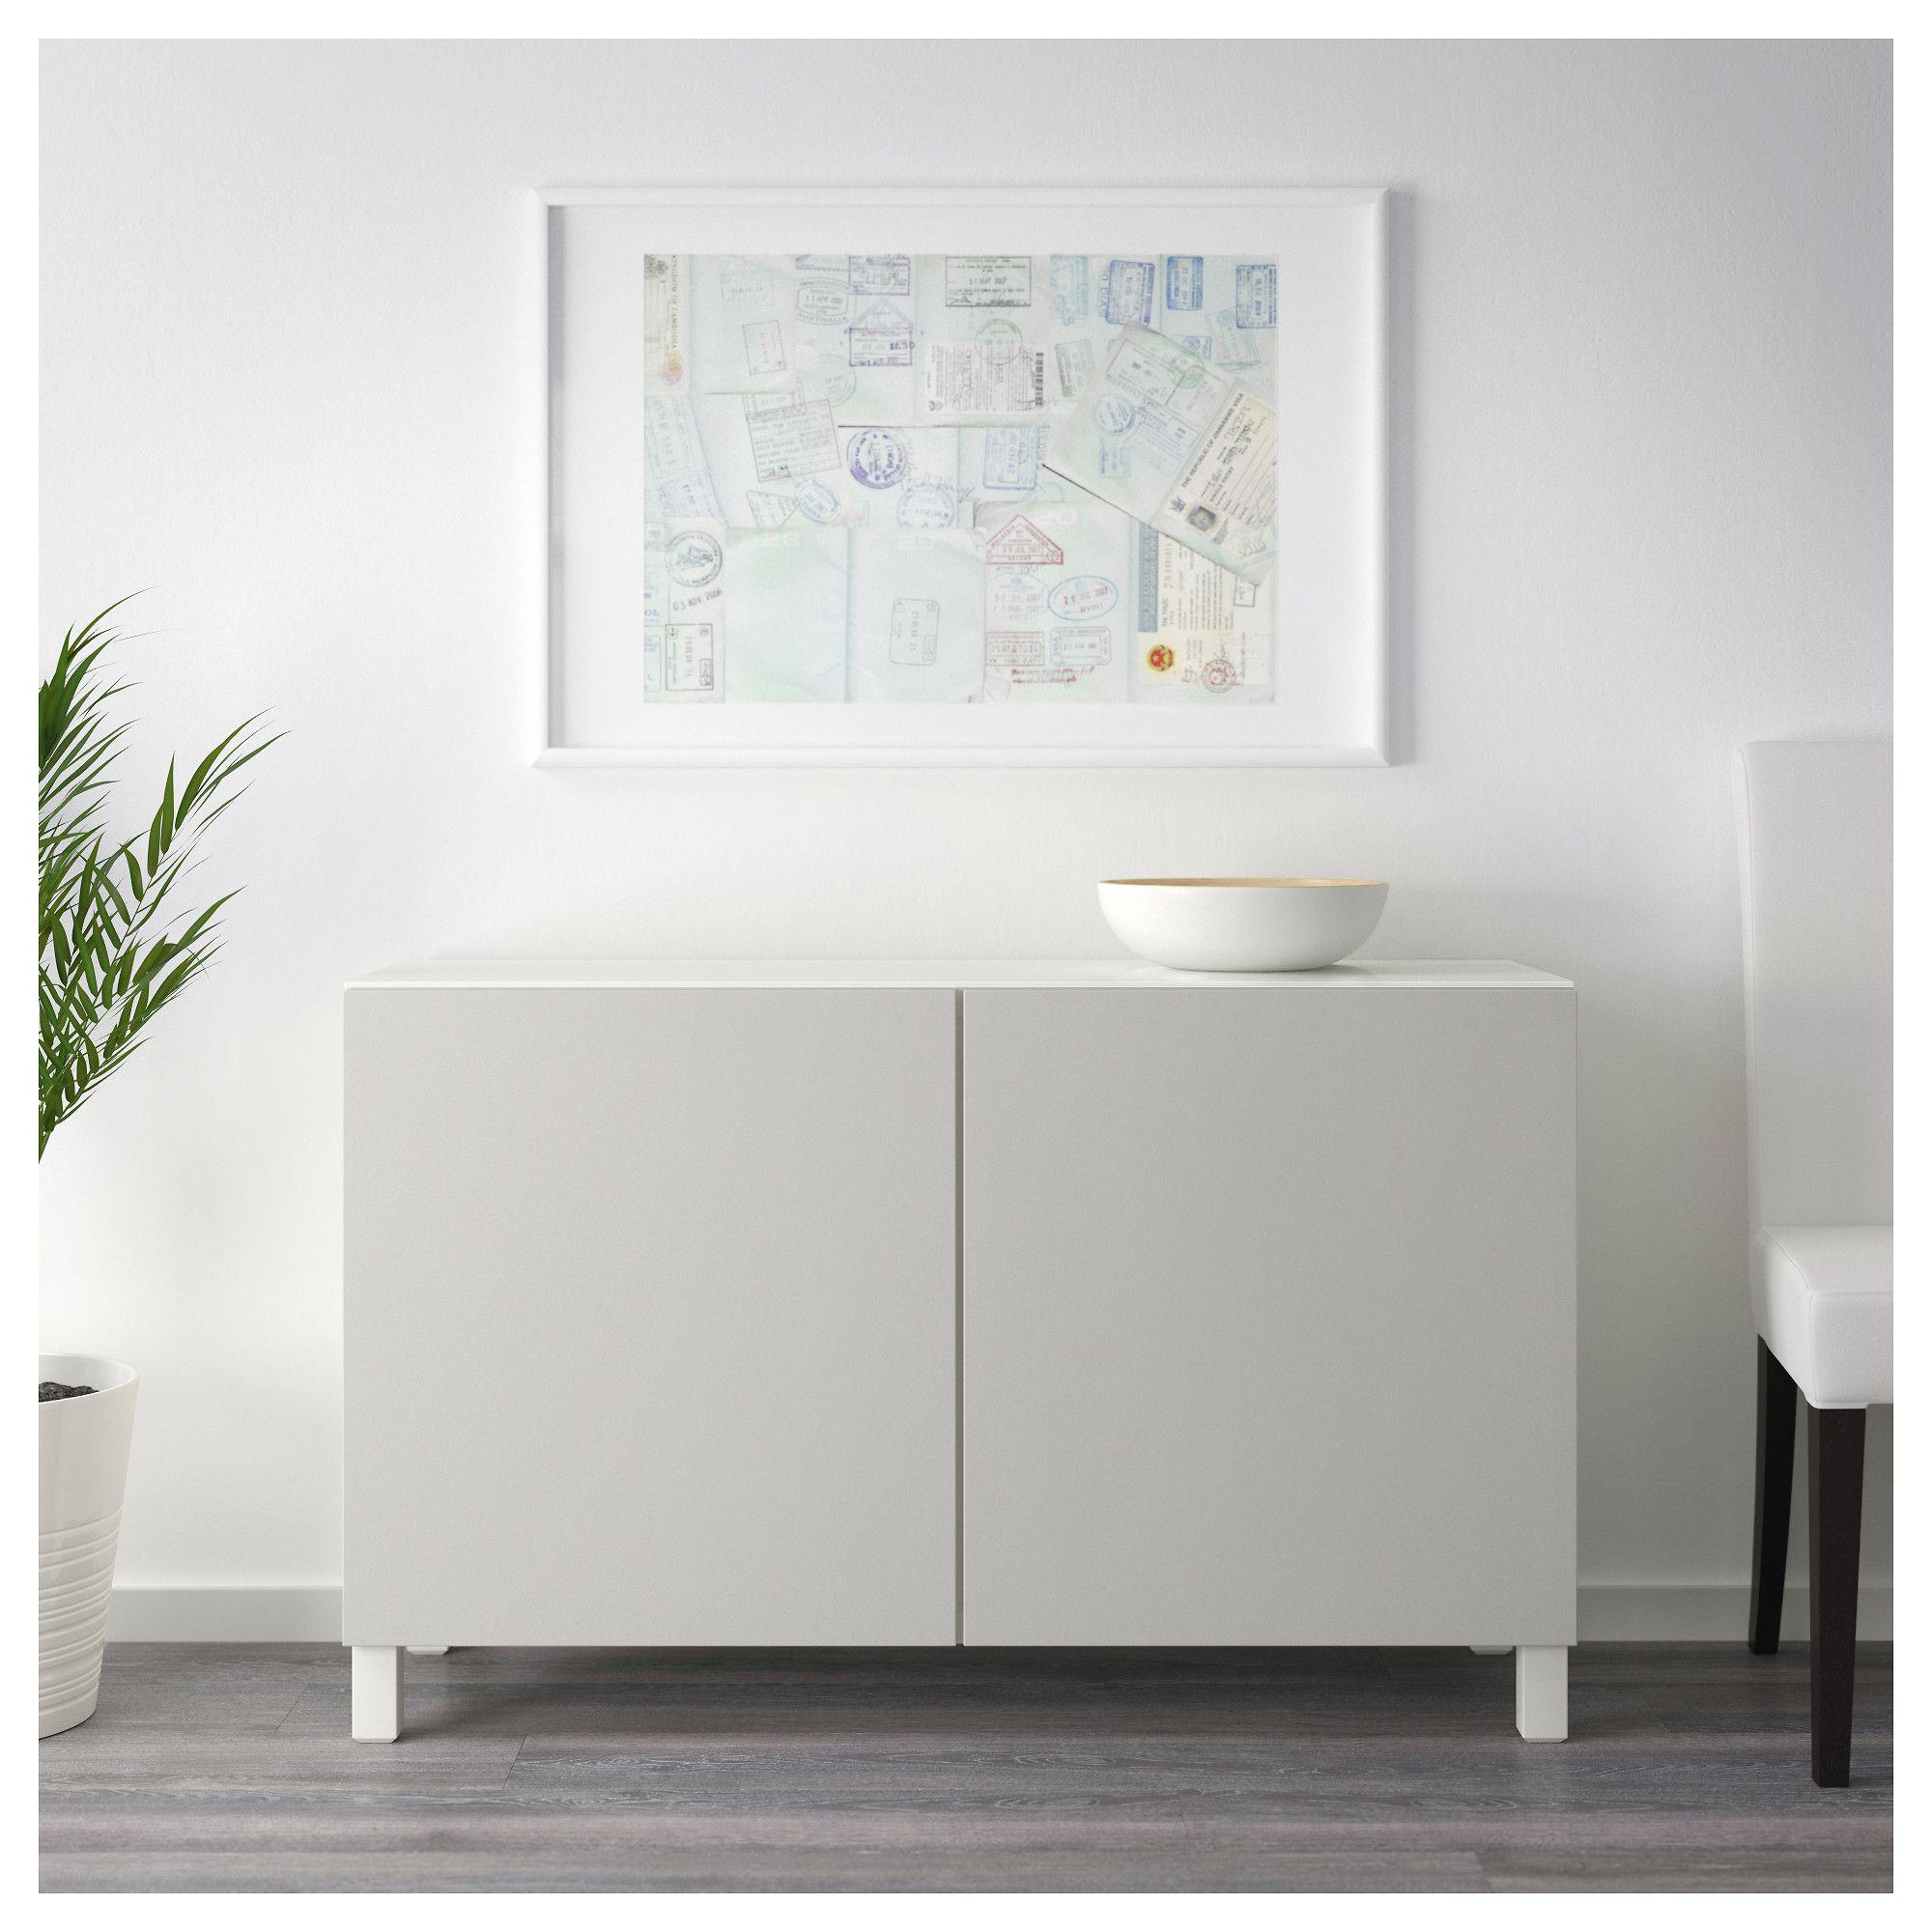 Furniture And Home Furnishings Rangement Pour Porte Rangement Modulaire Mobilier Maison